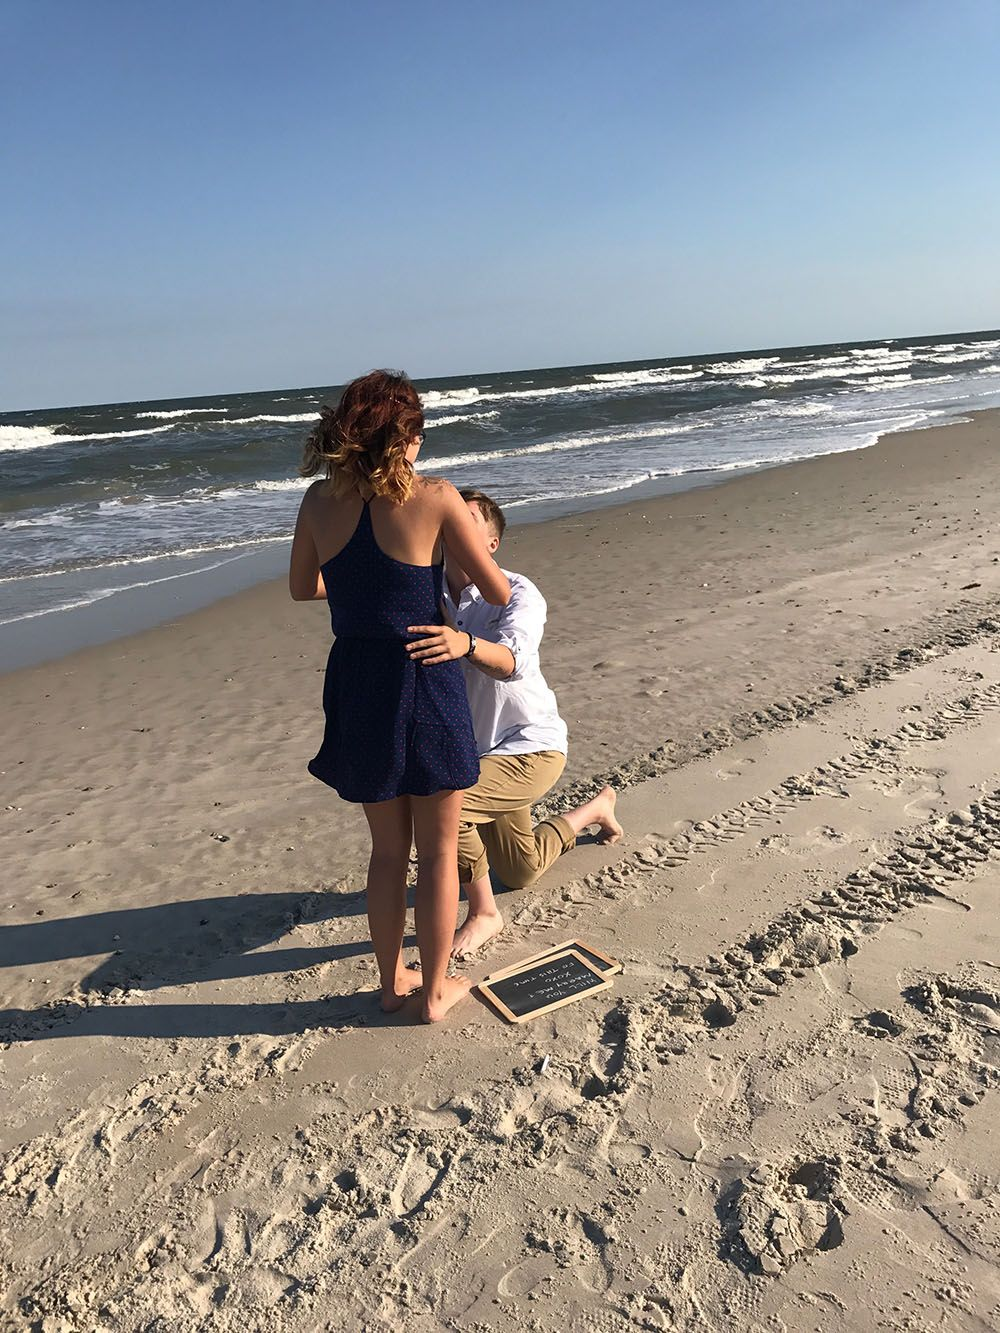 Couples having sex on the beach photo 229